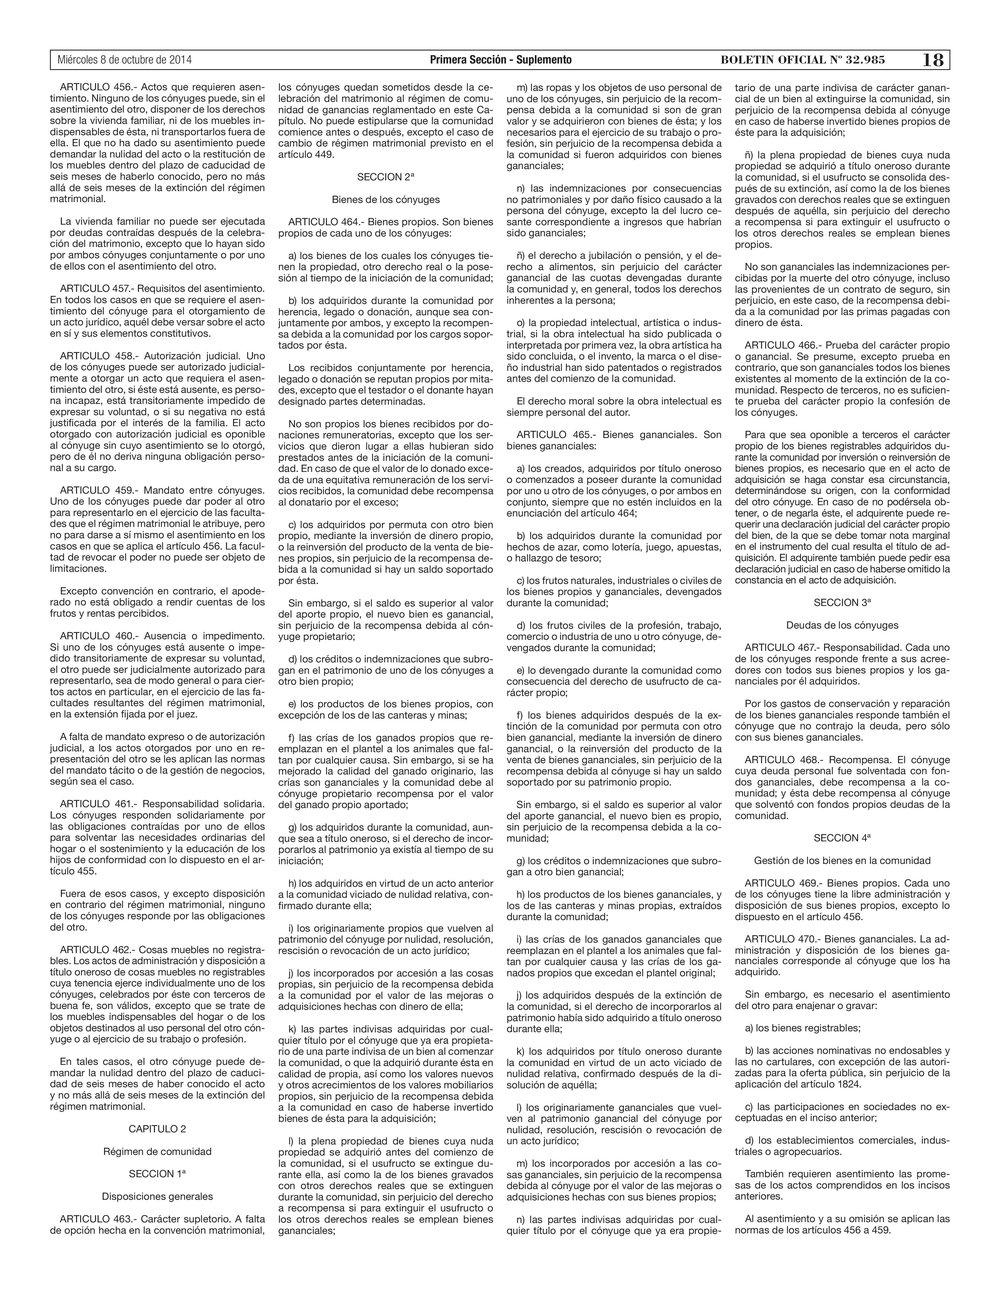 Argentina Codigo Civil-page-018.jpg